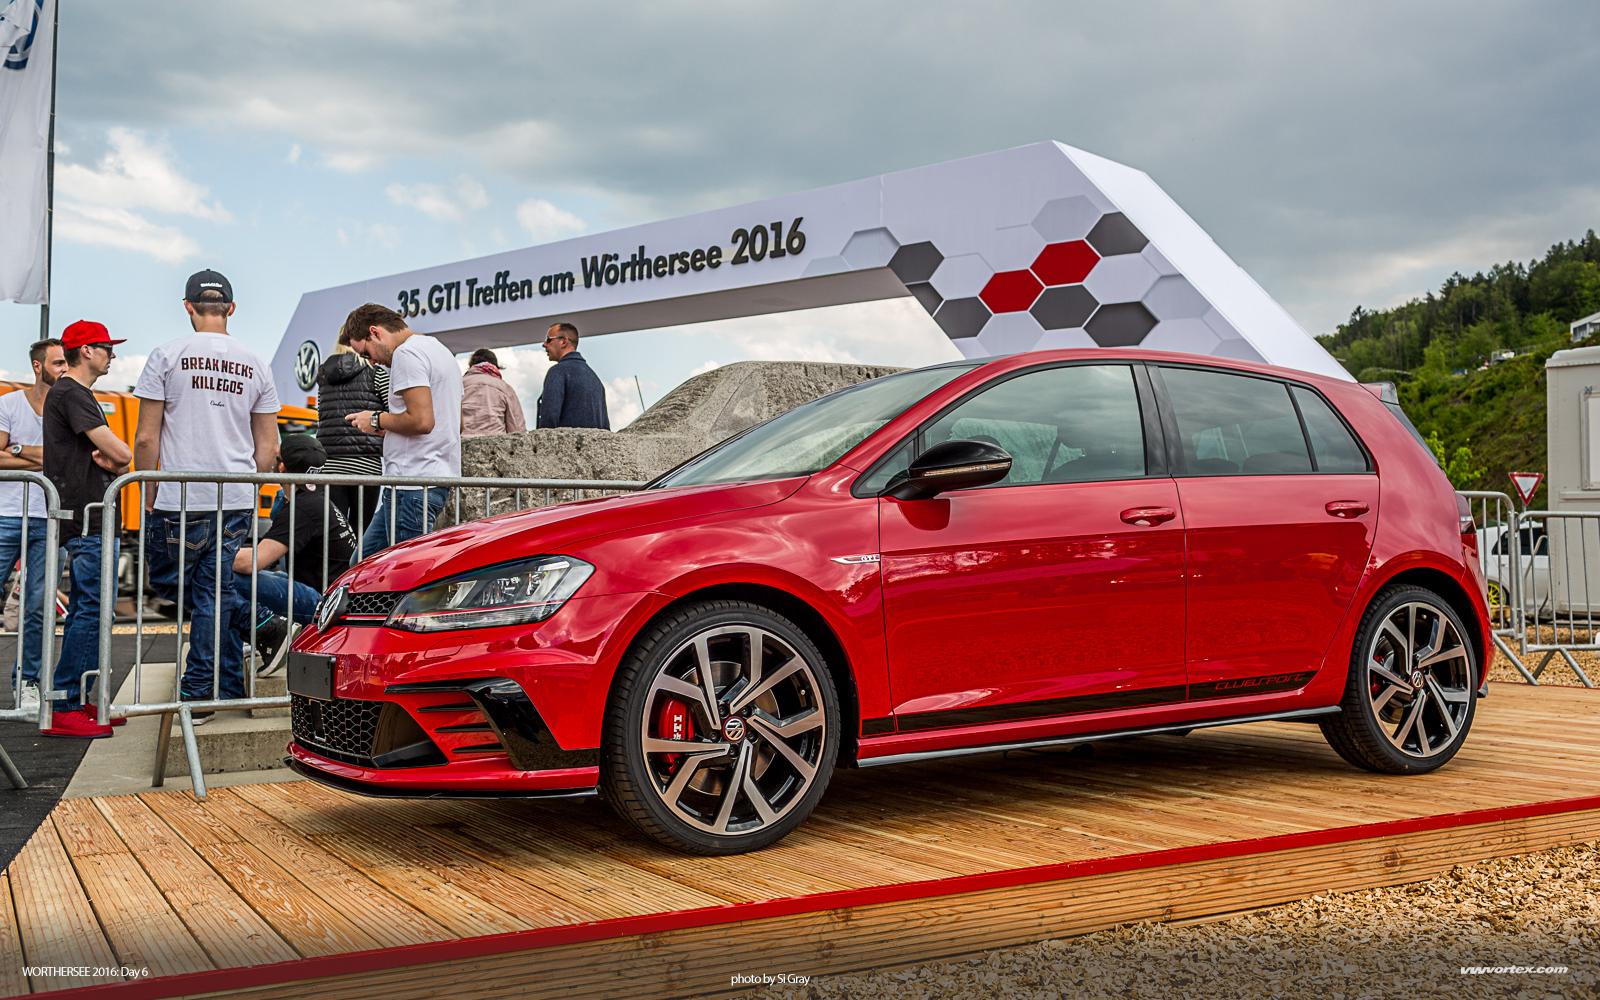 Audi R8 Test Mule spoiler 715 600x300 photo